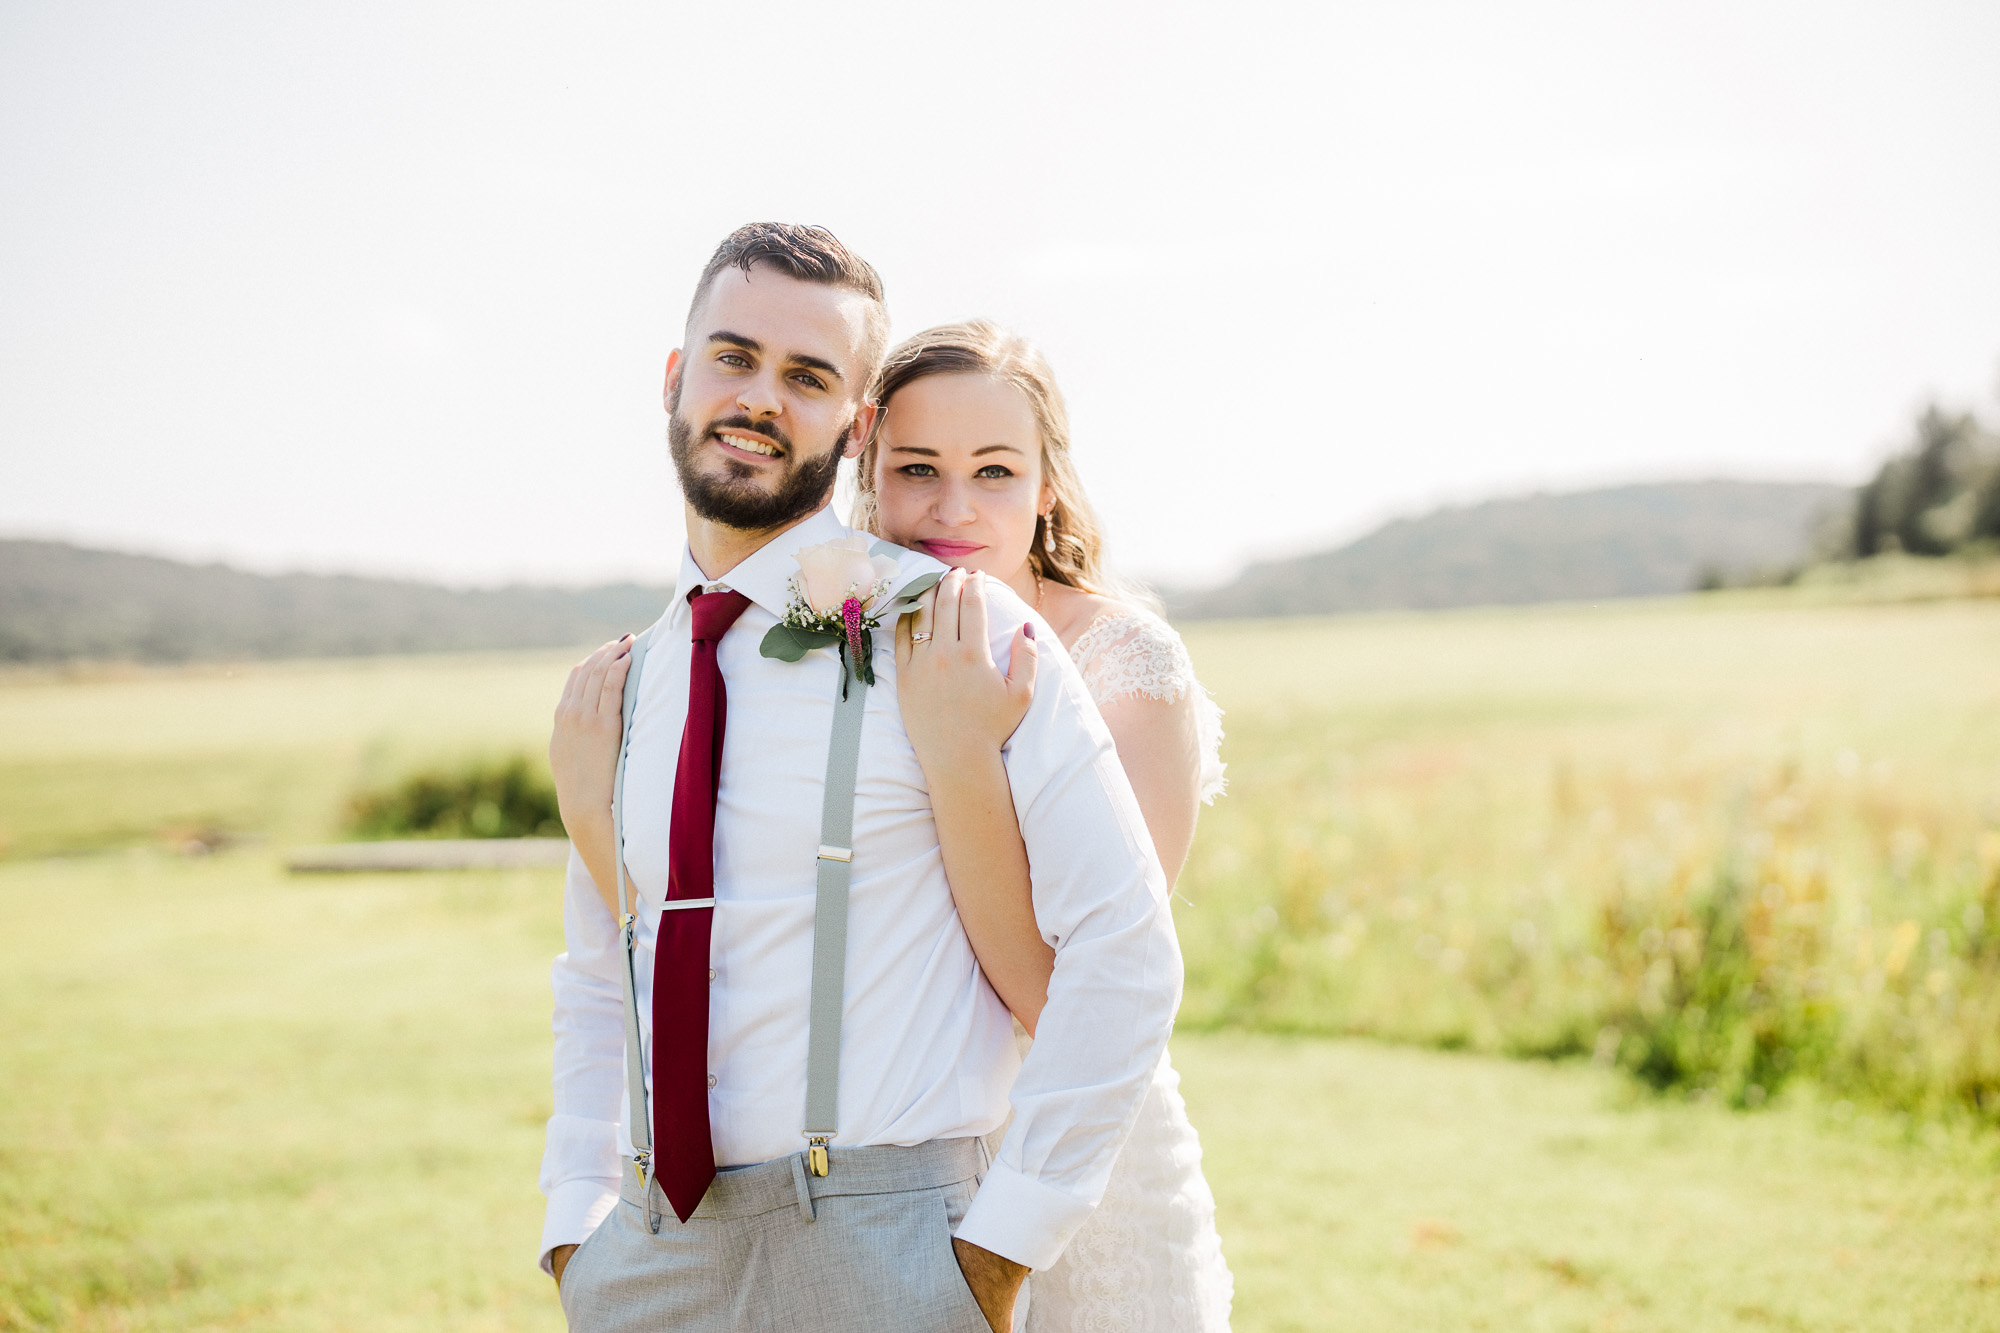 Stillwater-Christian_Church_Wedding-2067.jpg